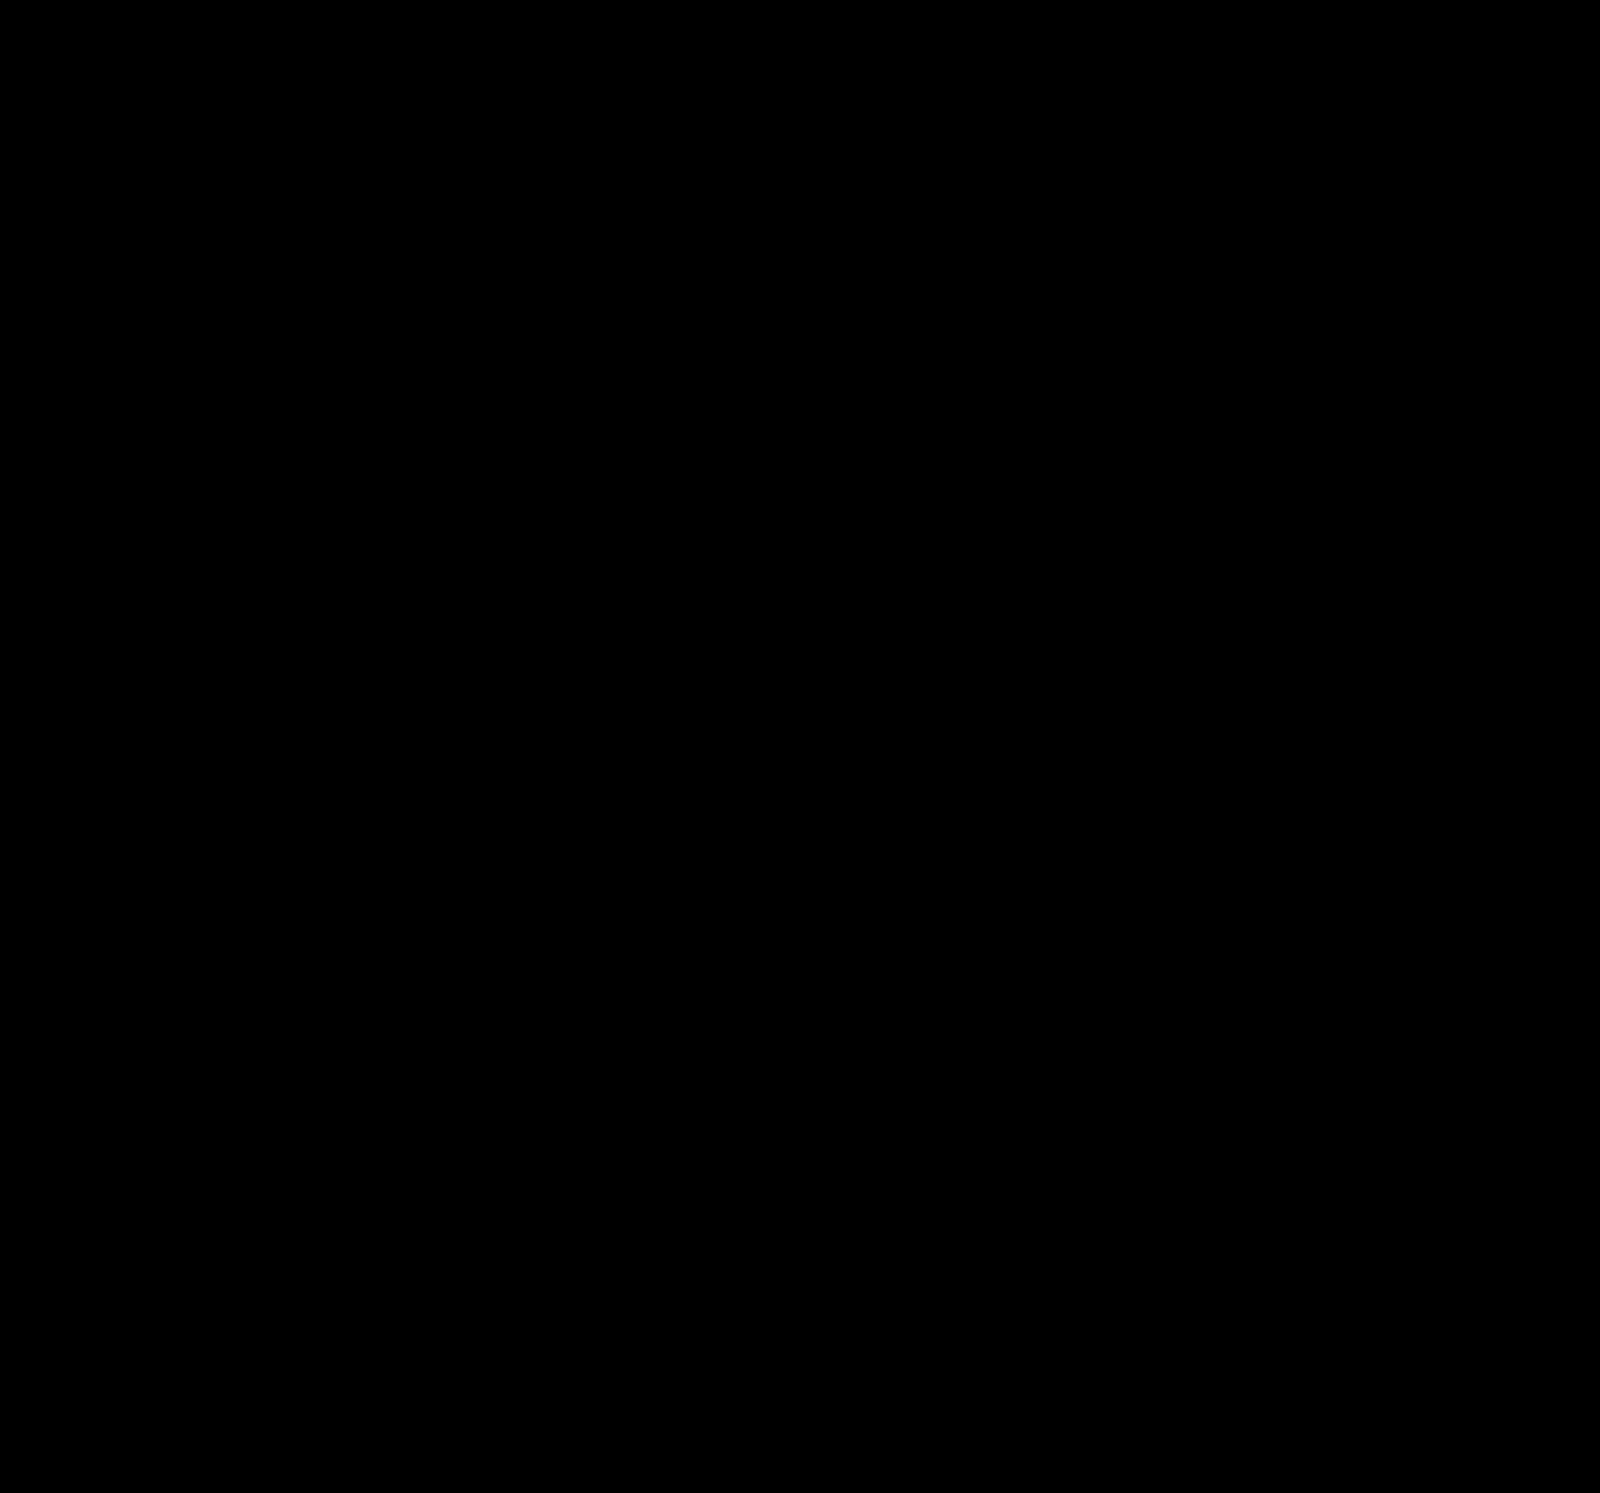 jordan logo 2 - Jordan Logo